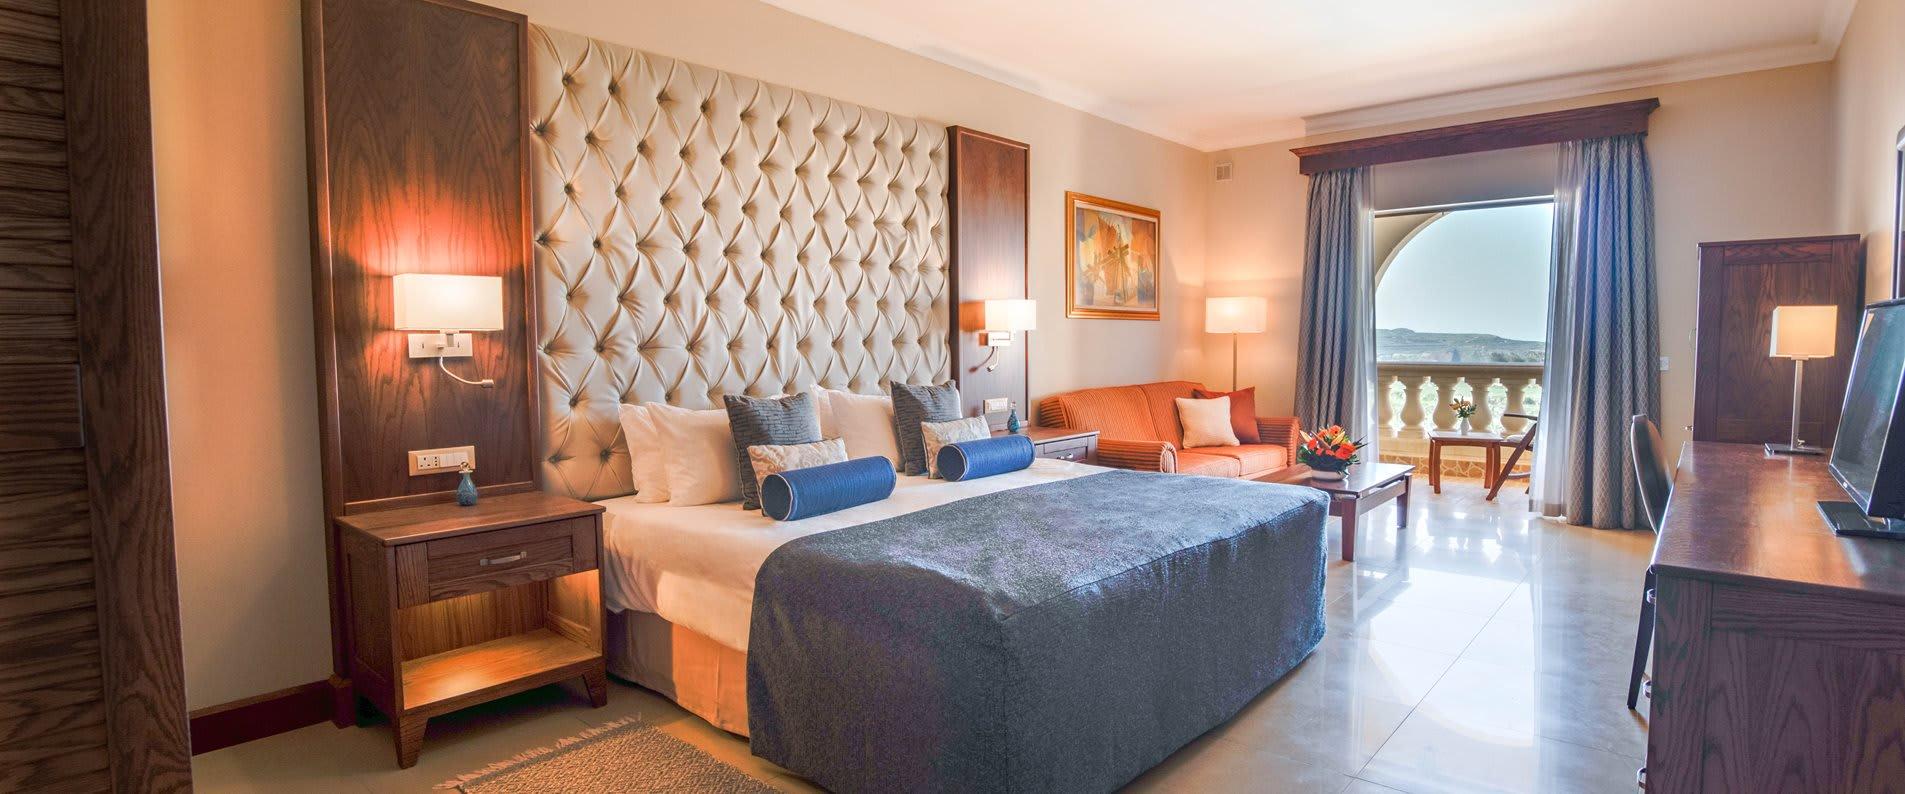 2 bedroom family suite1